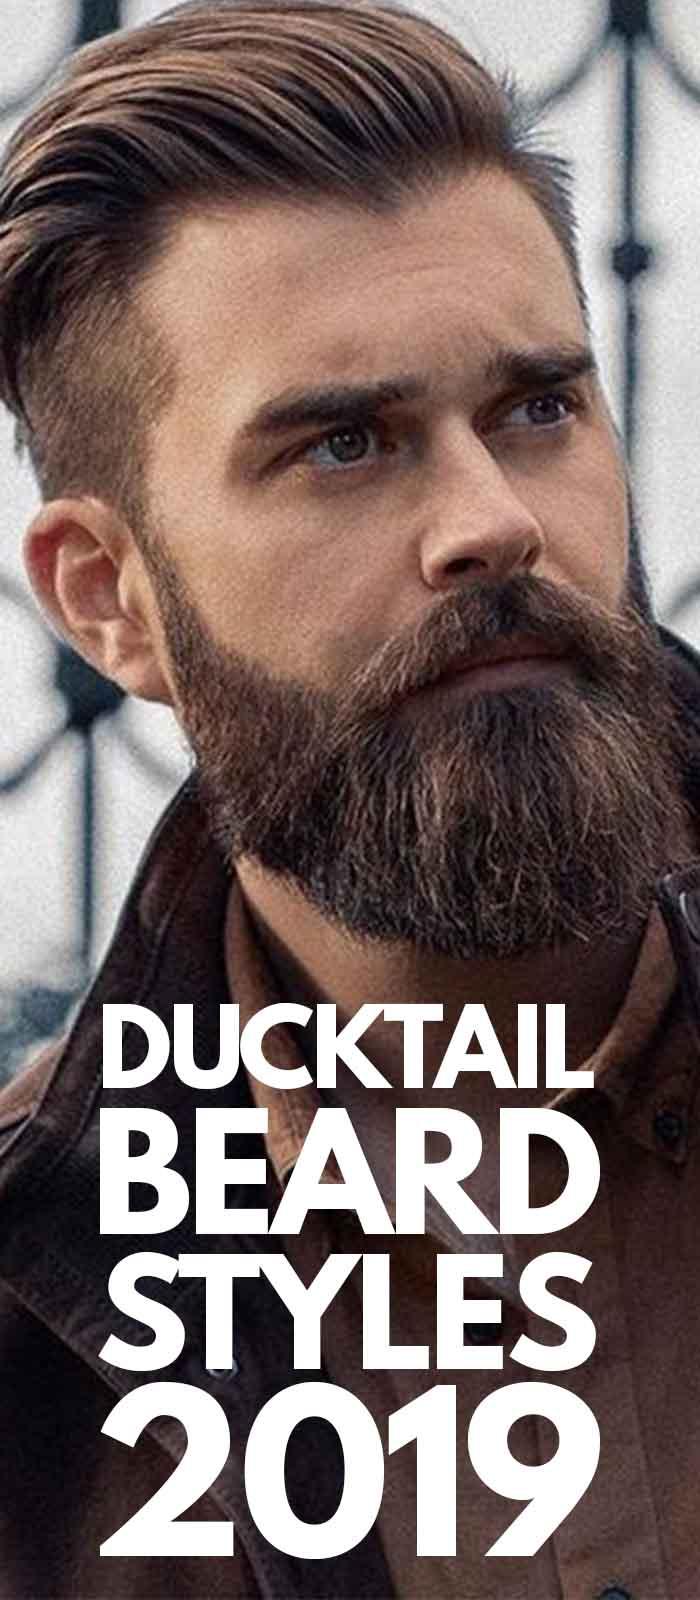 Brown Jacket Ducktail Beard!